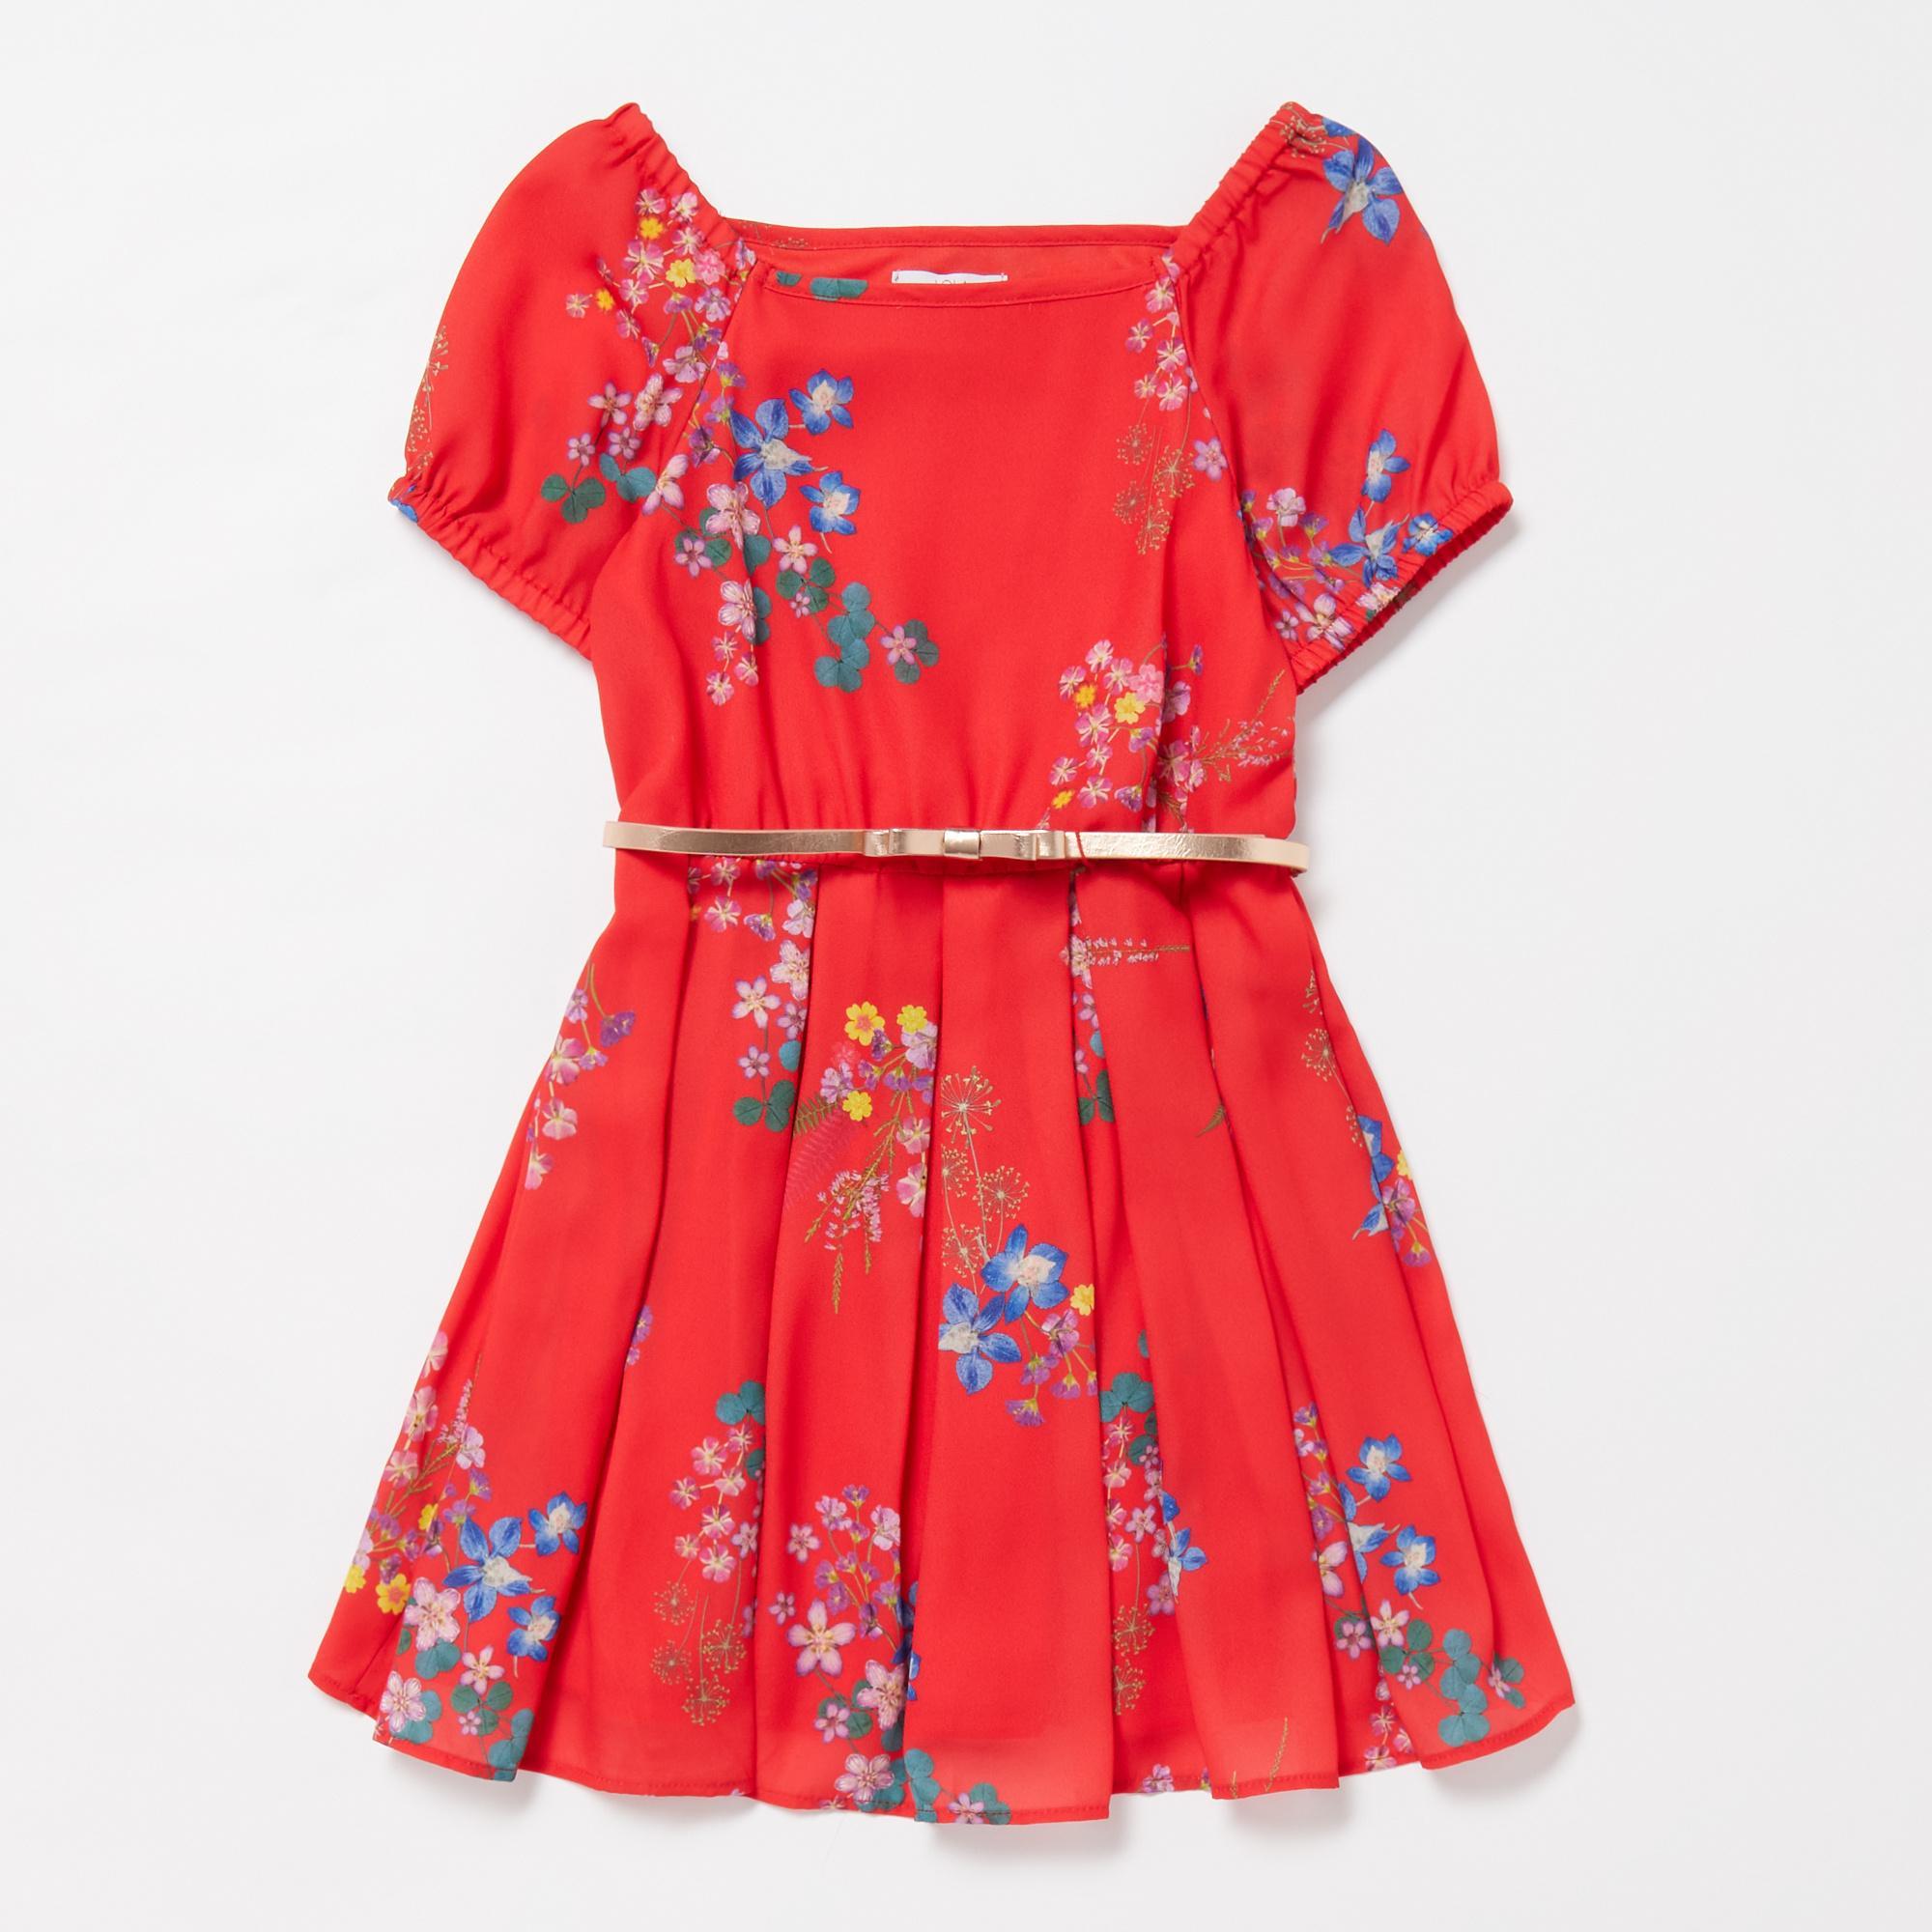 Lola & Maverick – Girls' Pink Floral Print Dress